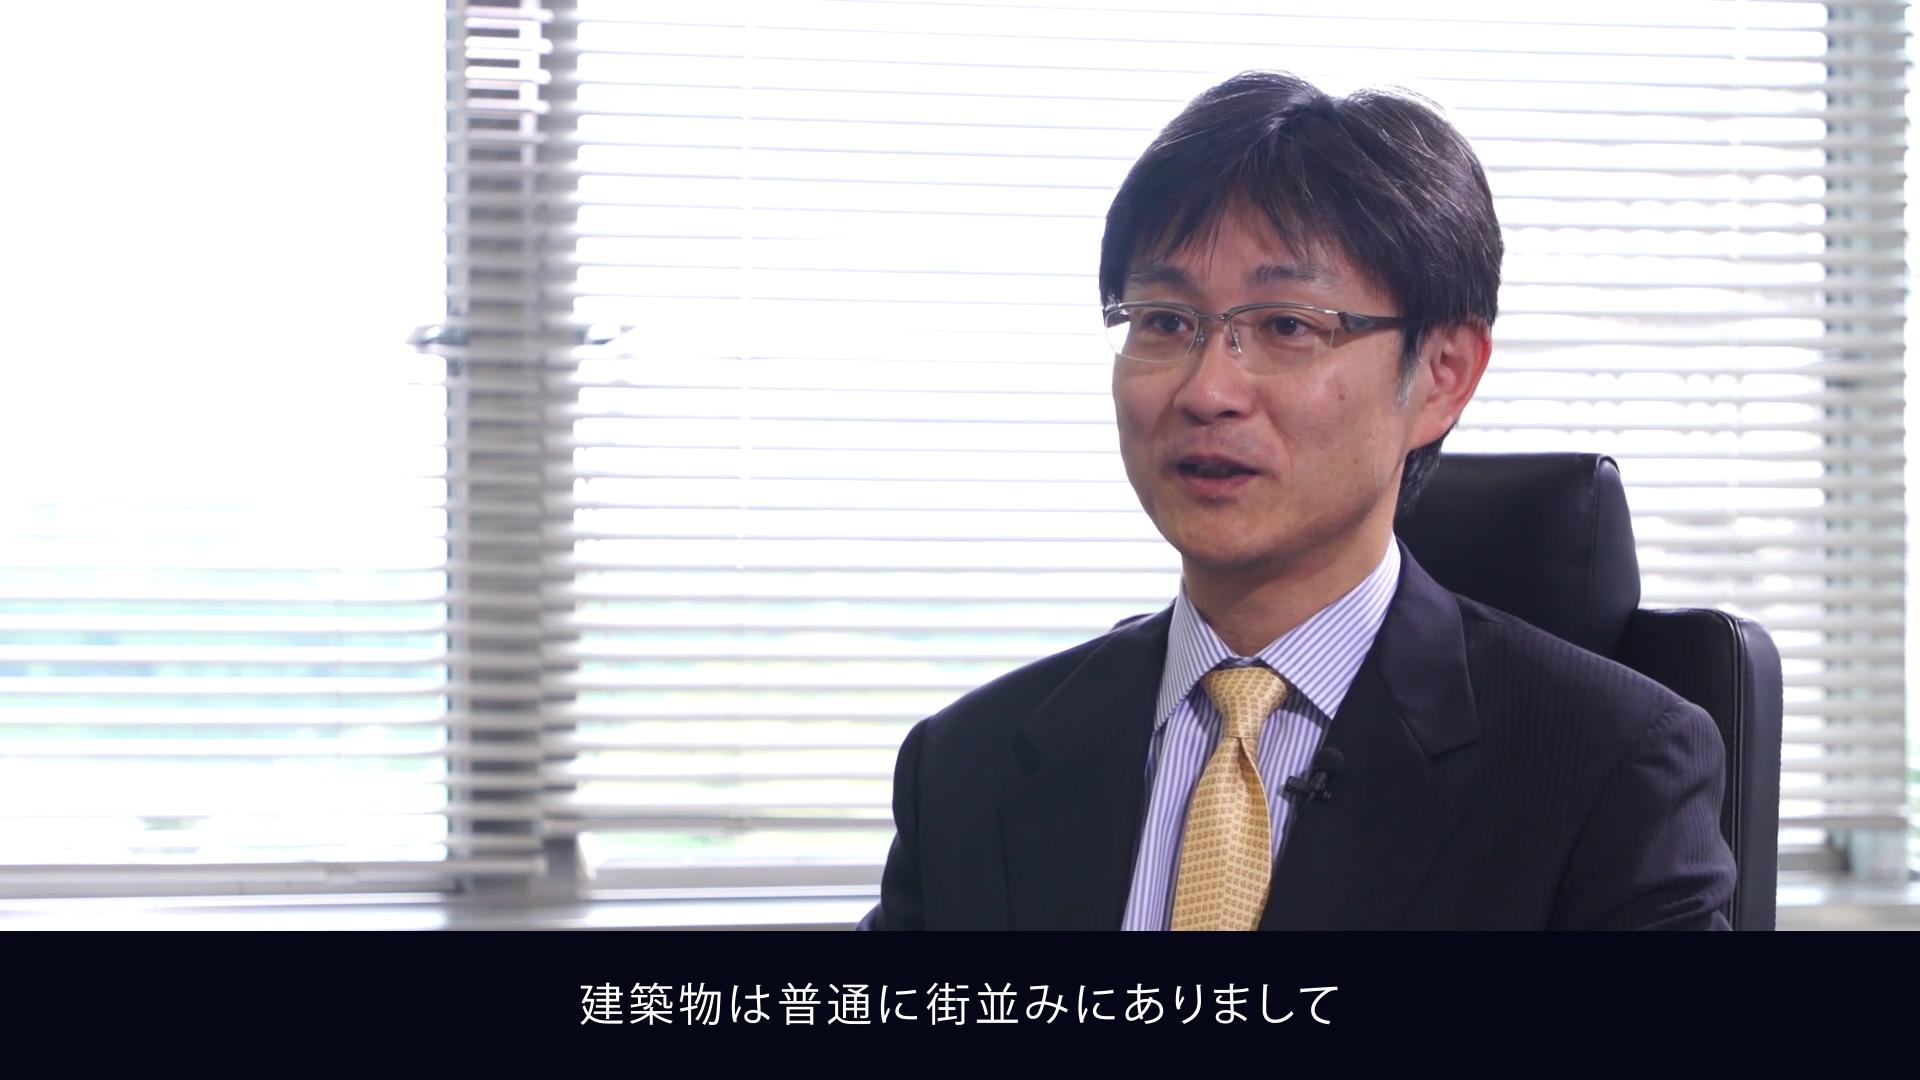 interview07-v2